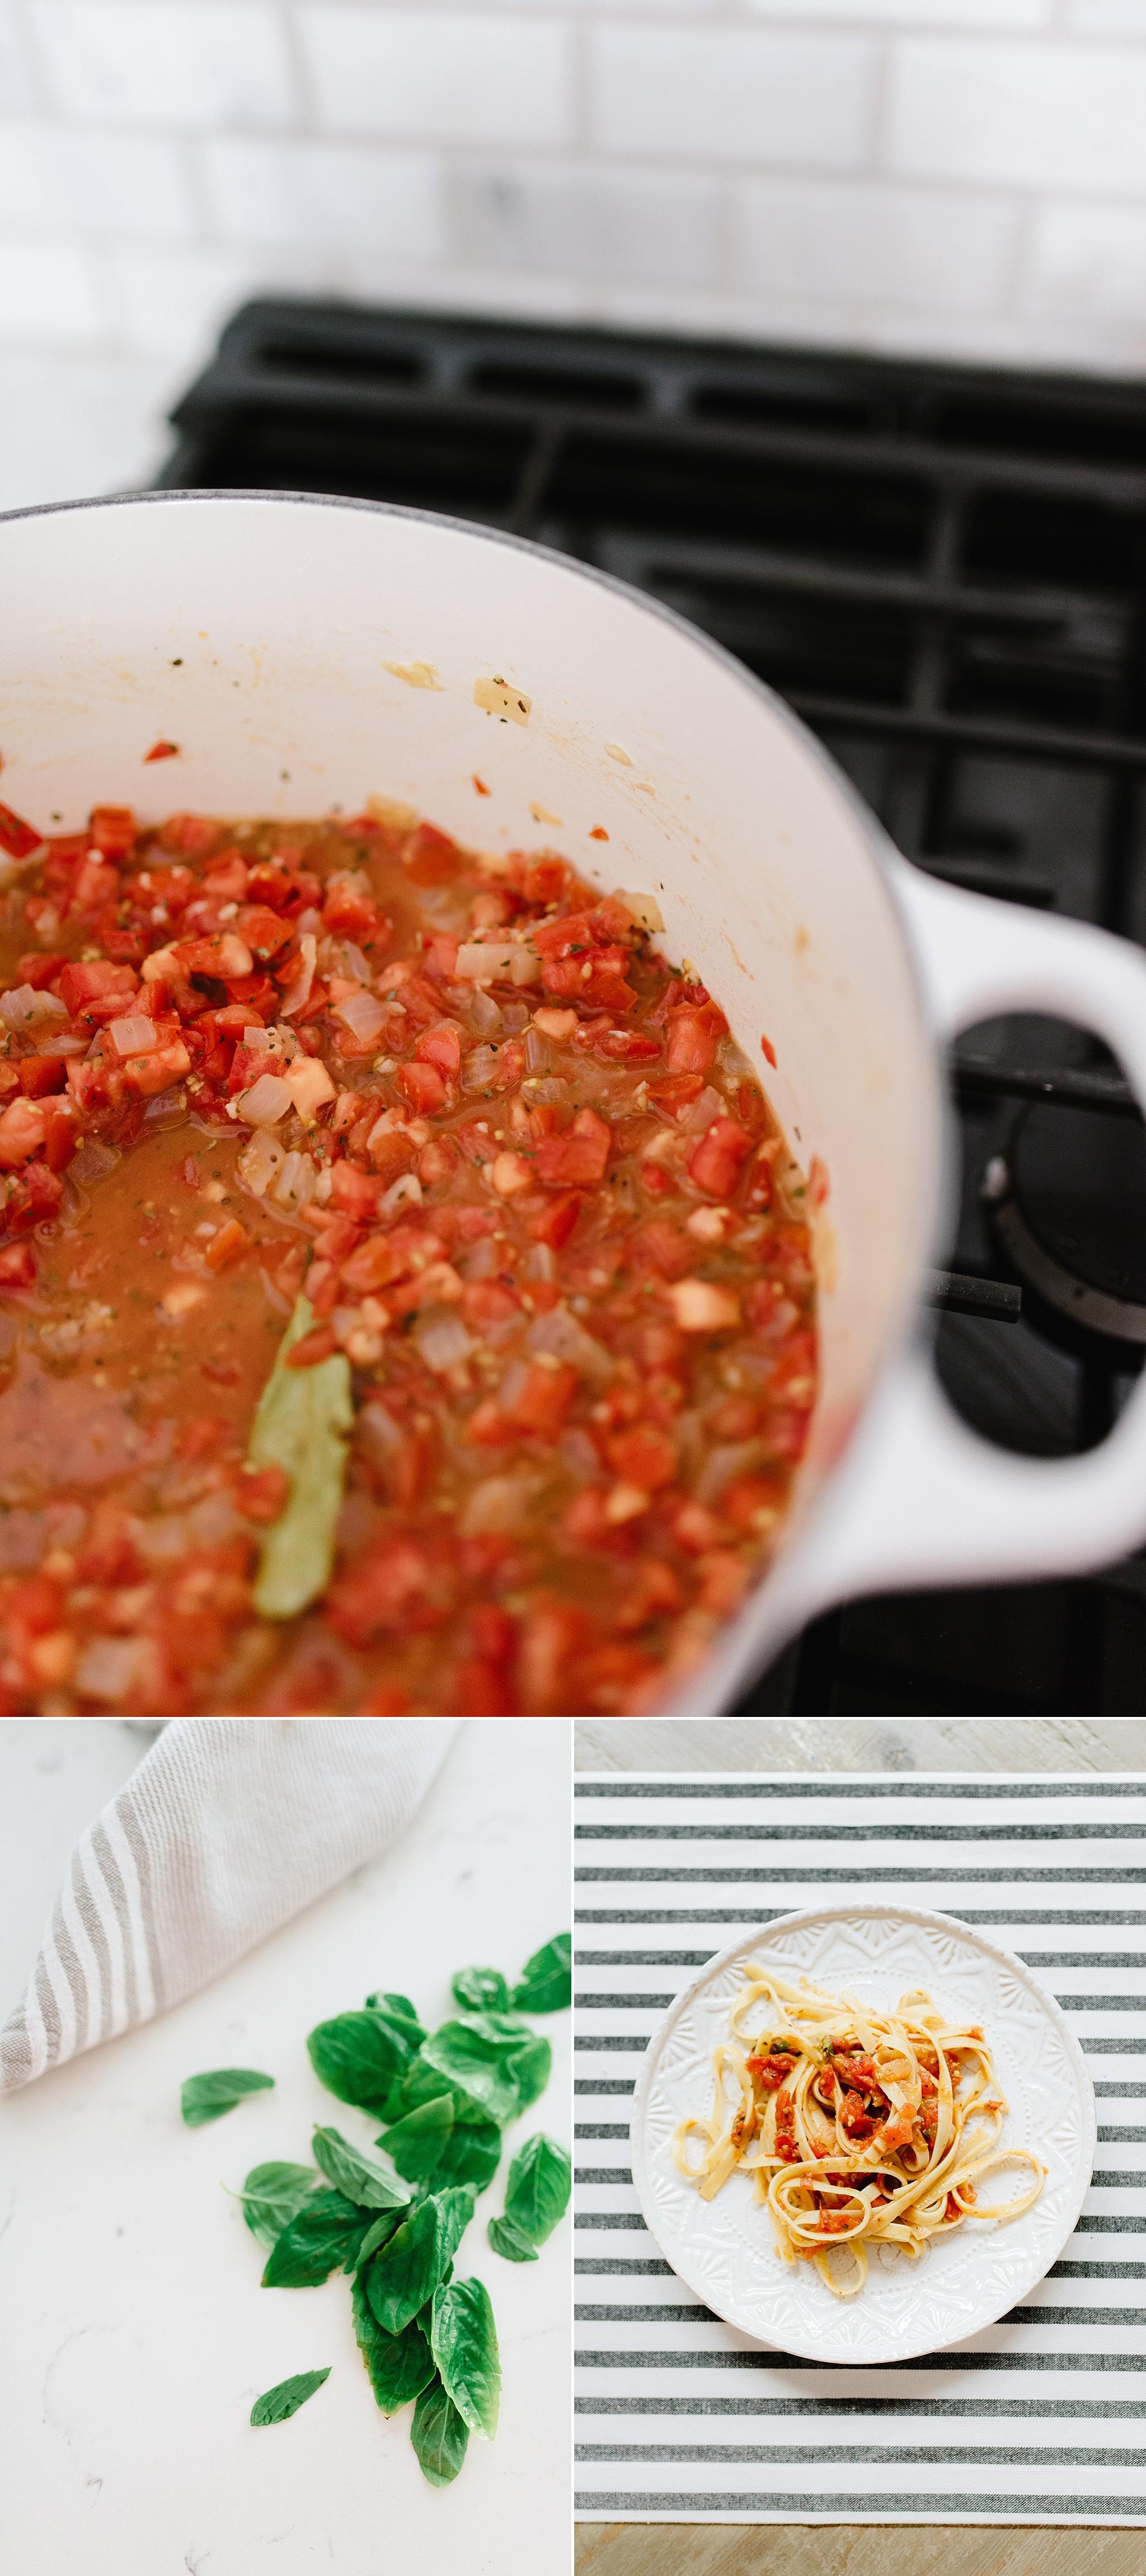 Fresh Tomato Basil Sauce_Cathy Durig_0003.jpg